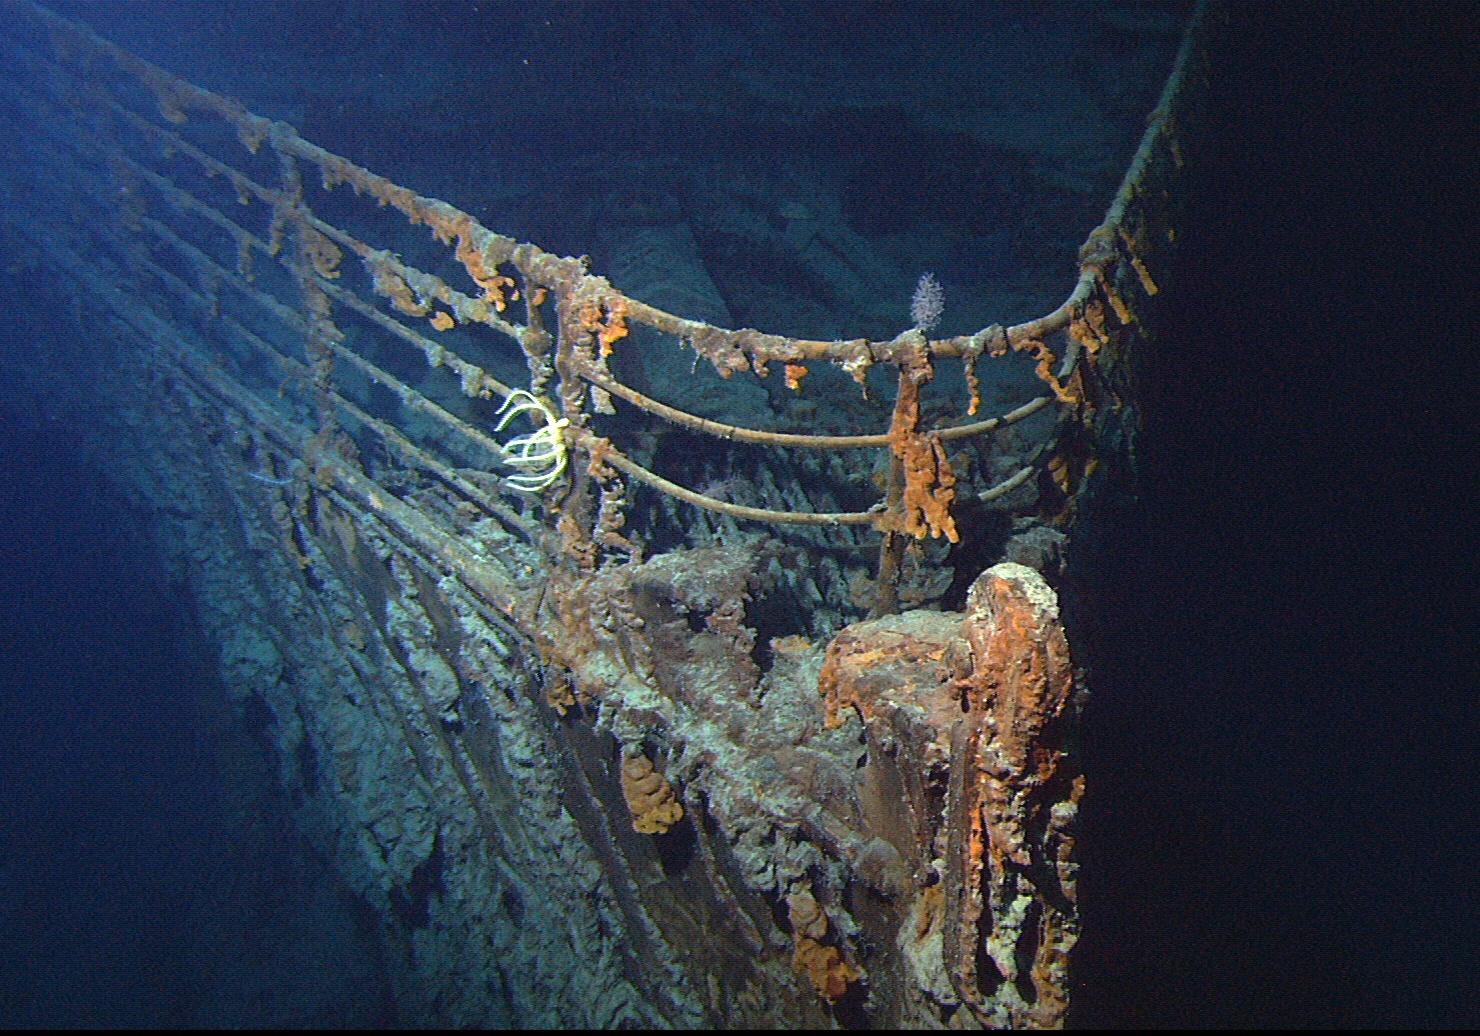 Titanic wreckage found in 1980